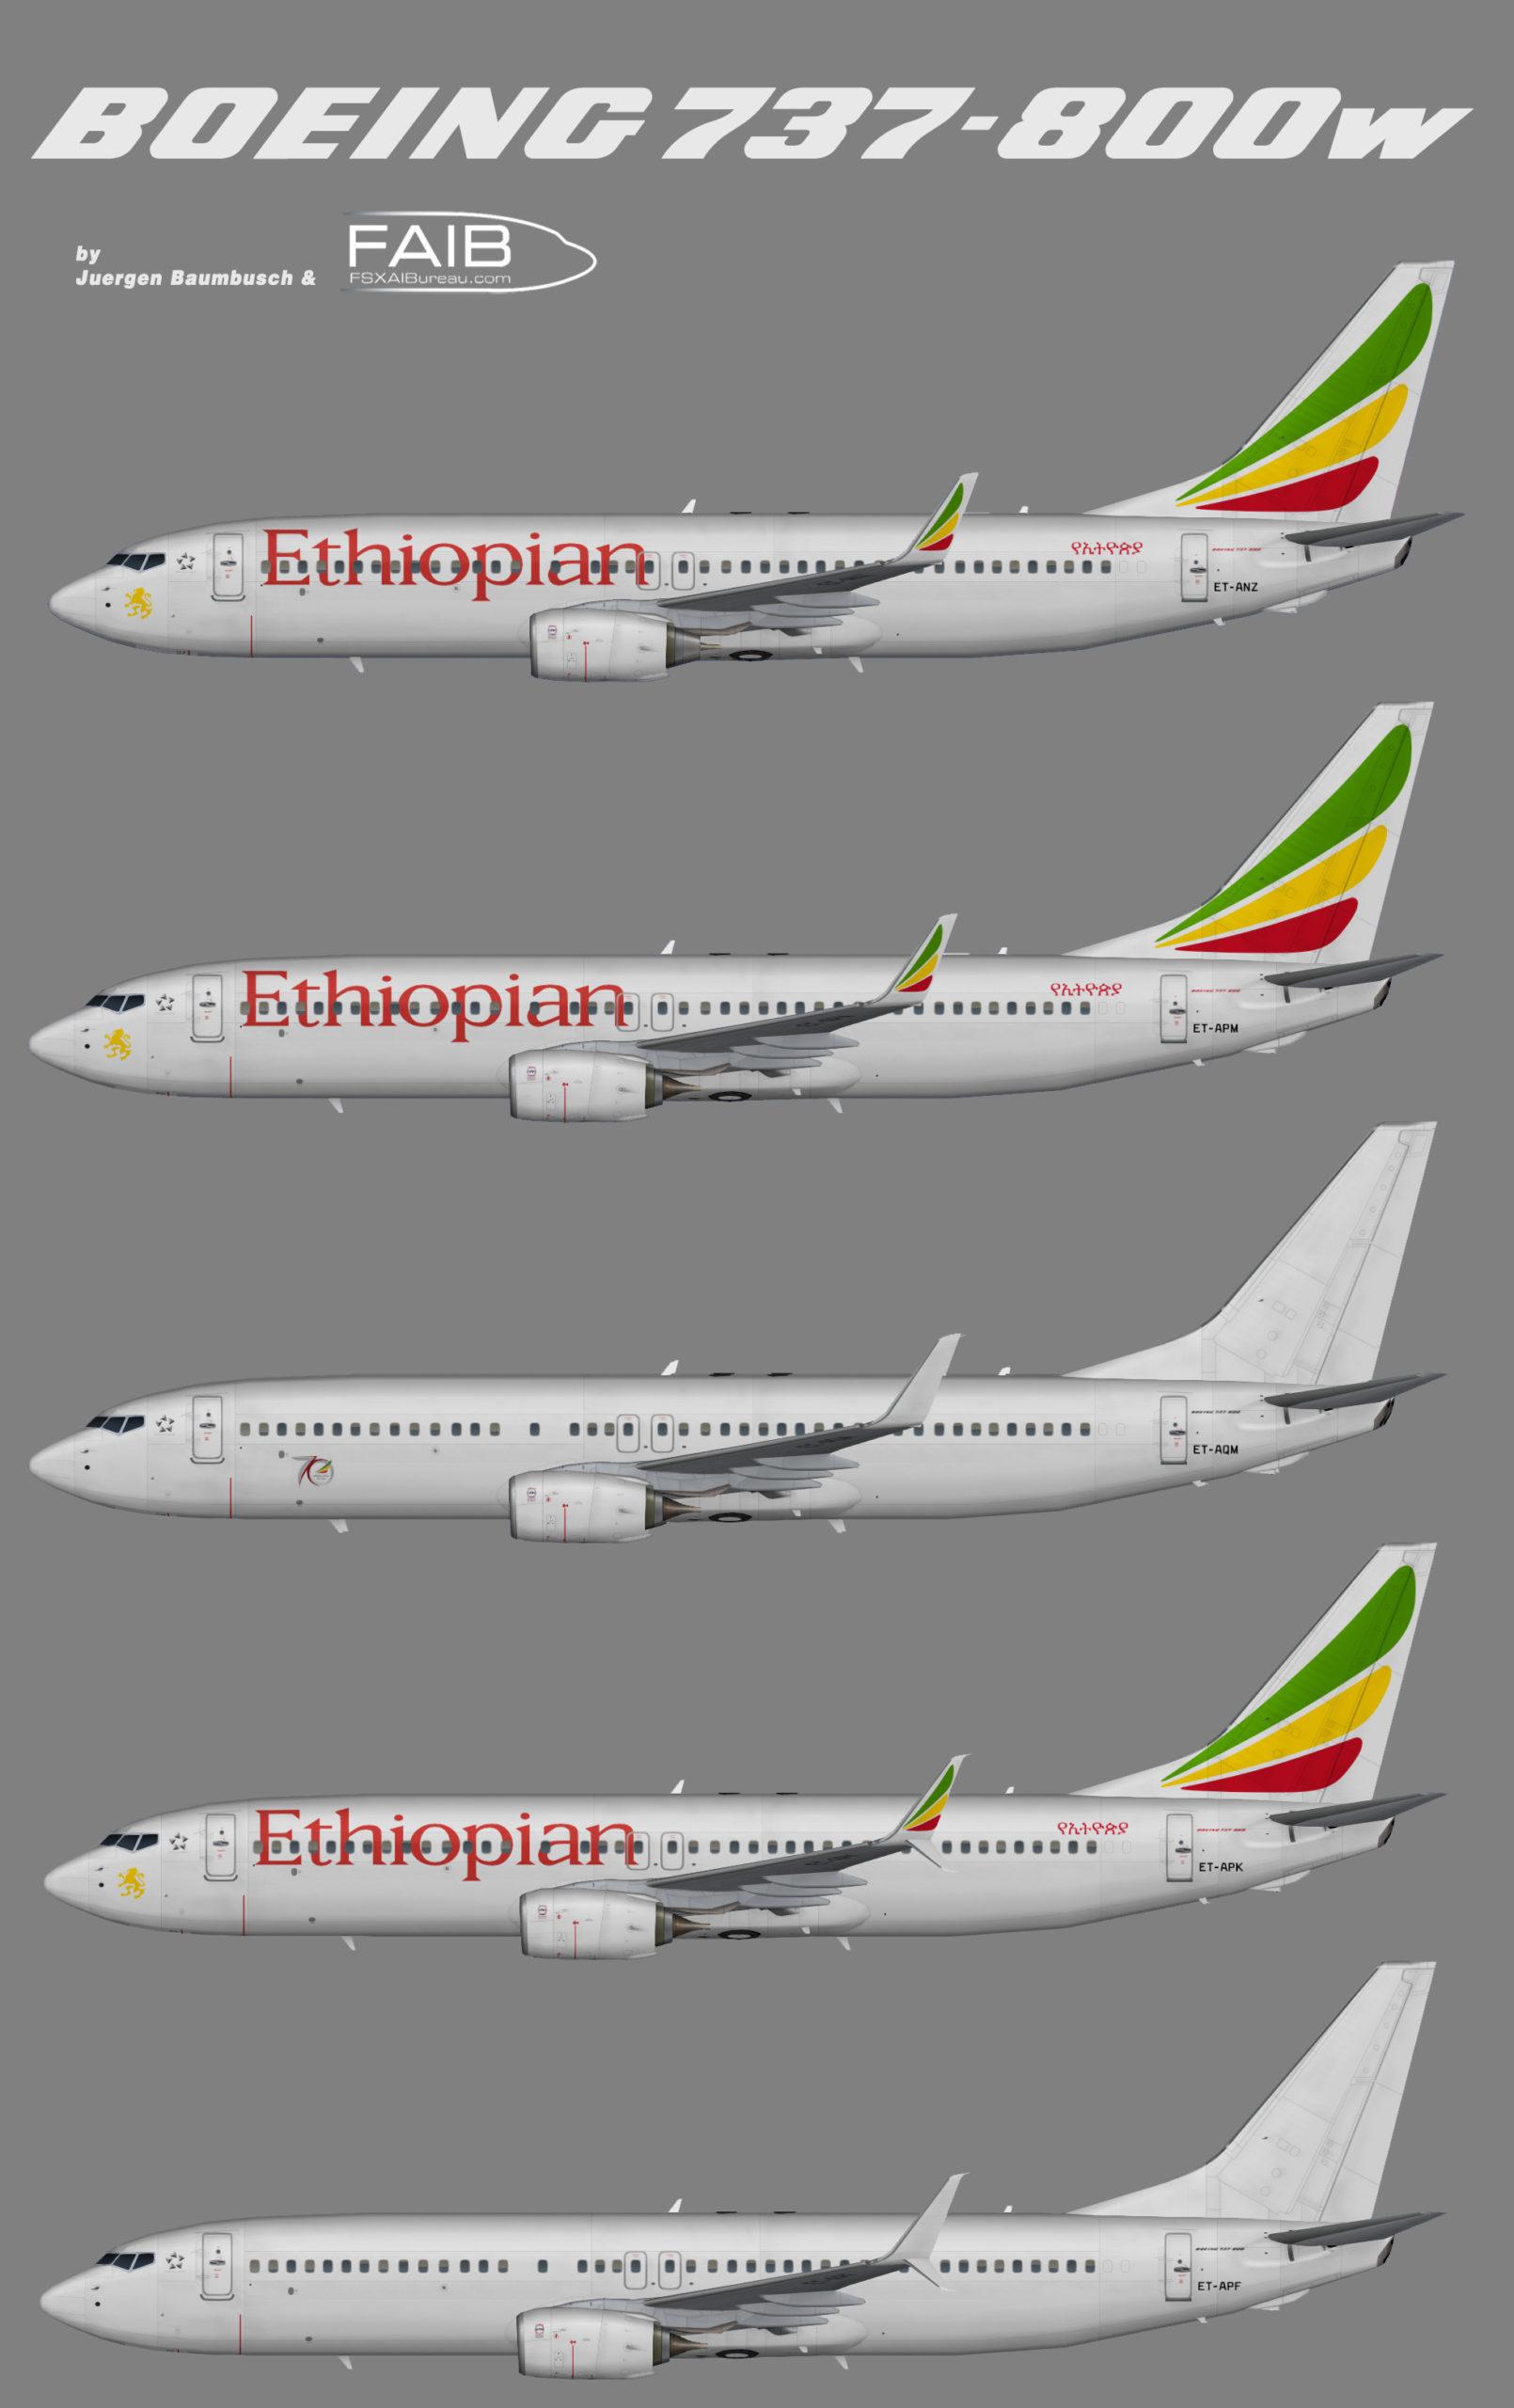 Ethiopian Airlines Boeing 737-800w